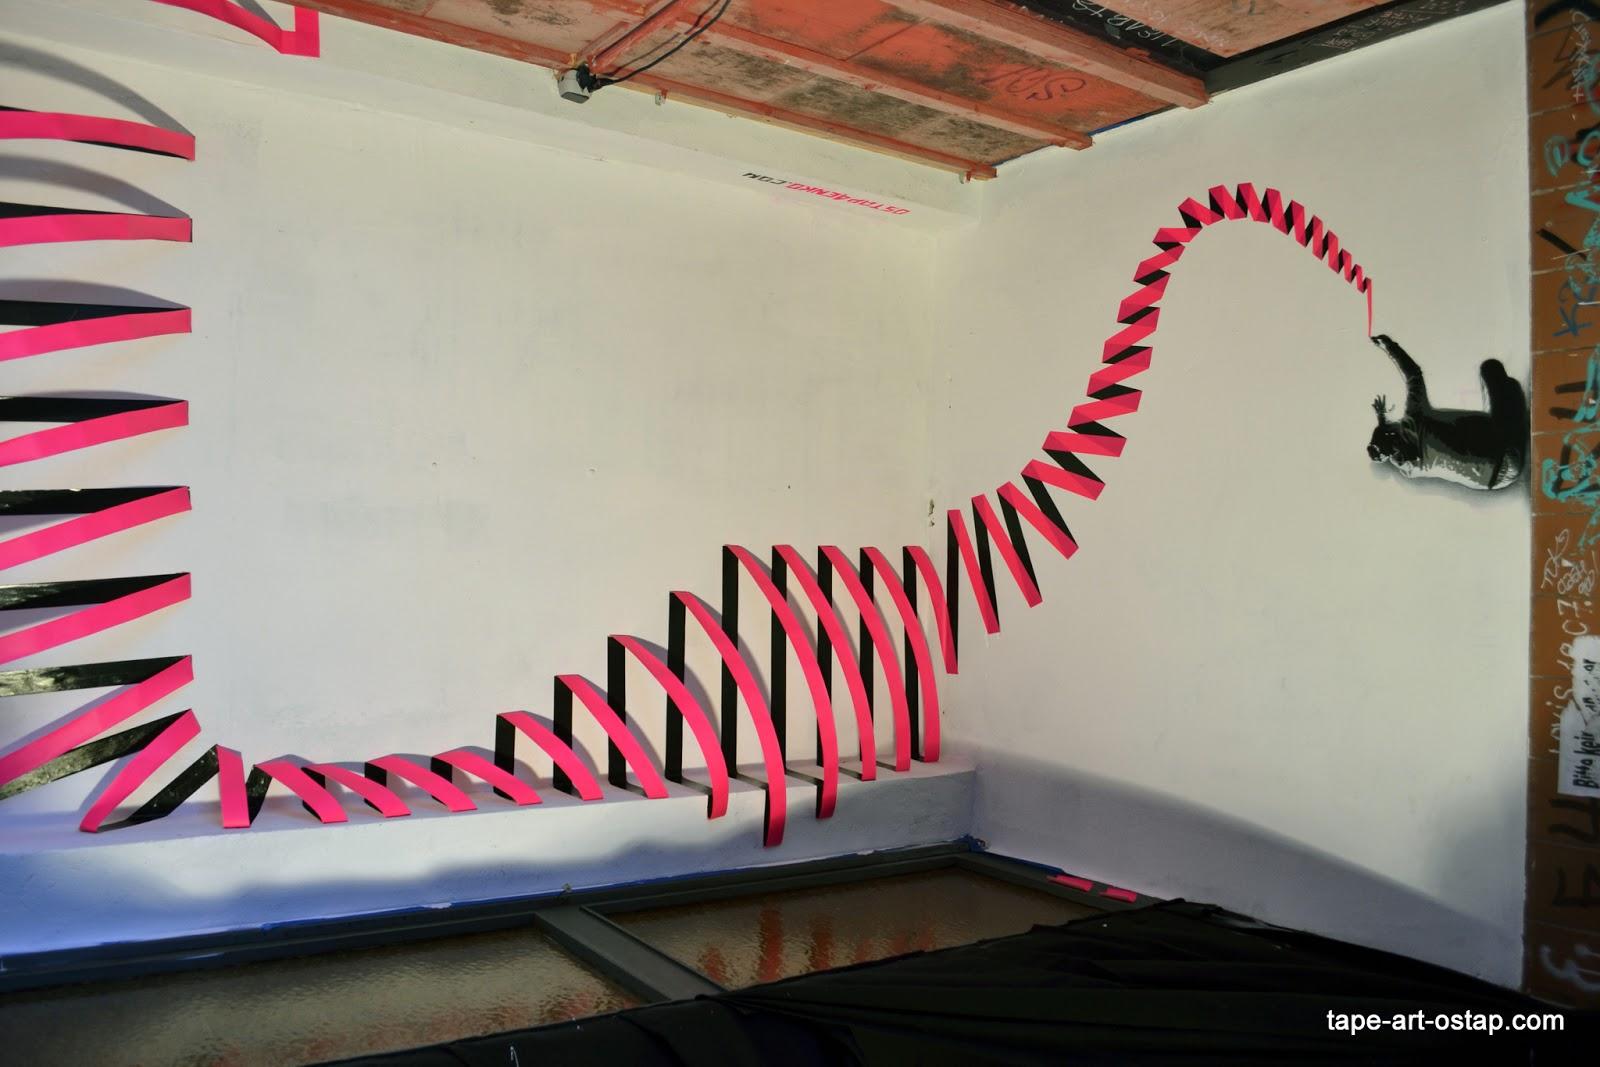 3D Tape Art Installation & 3D Tape Art Installation   Ostapu0027s Tape Art and Street Art Blog